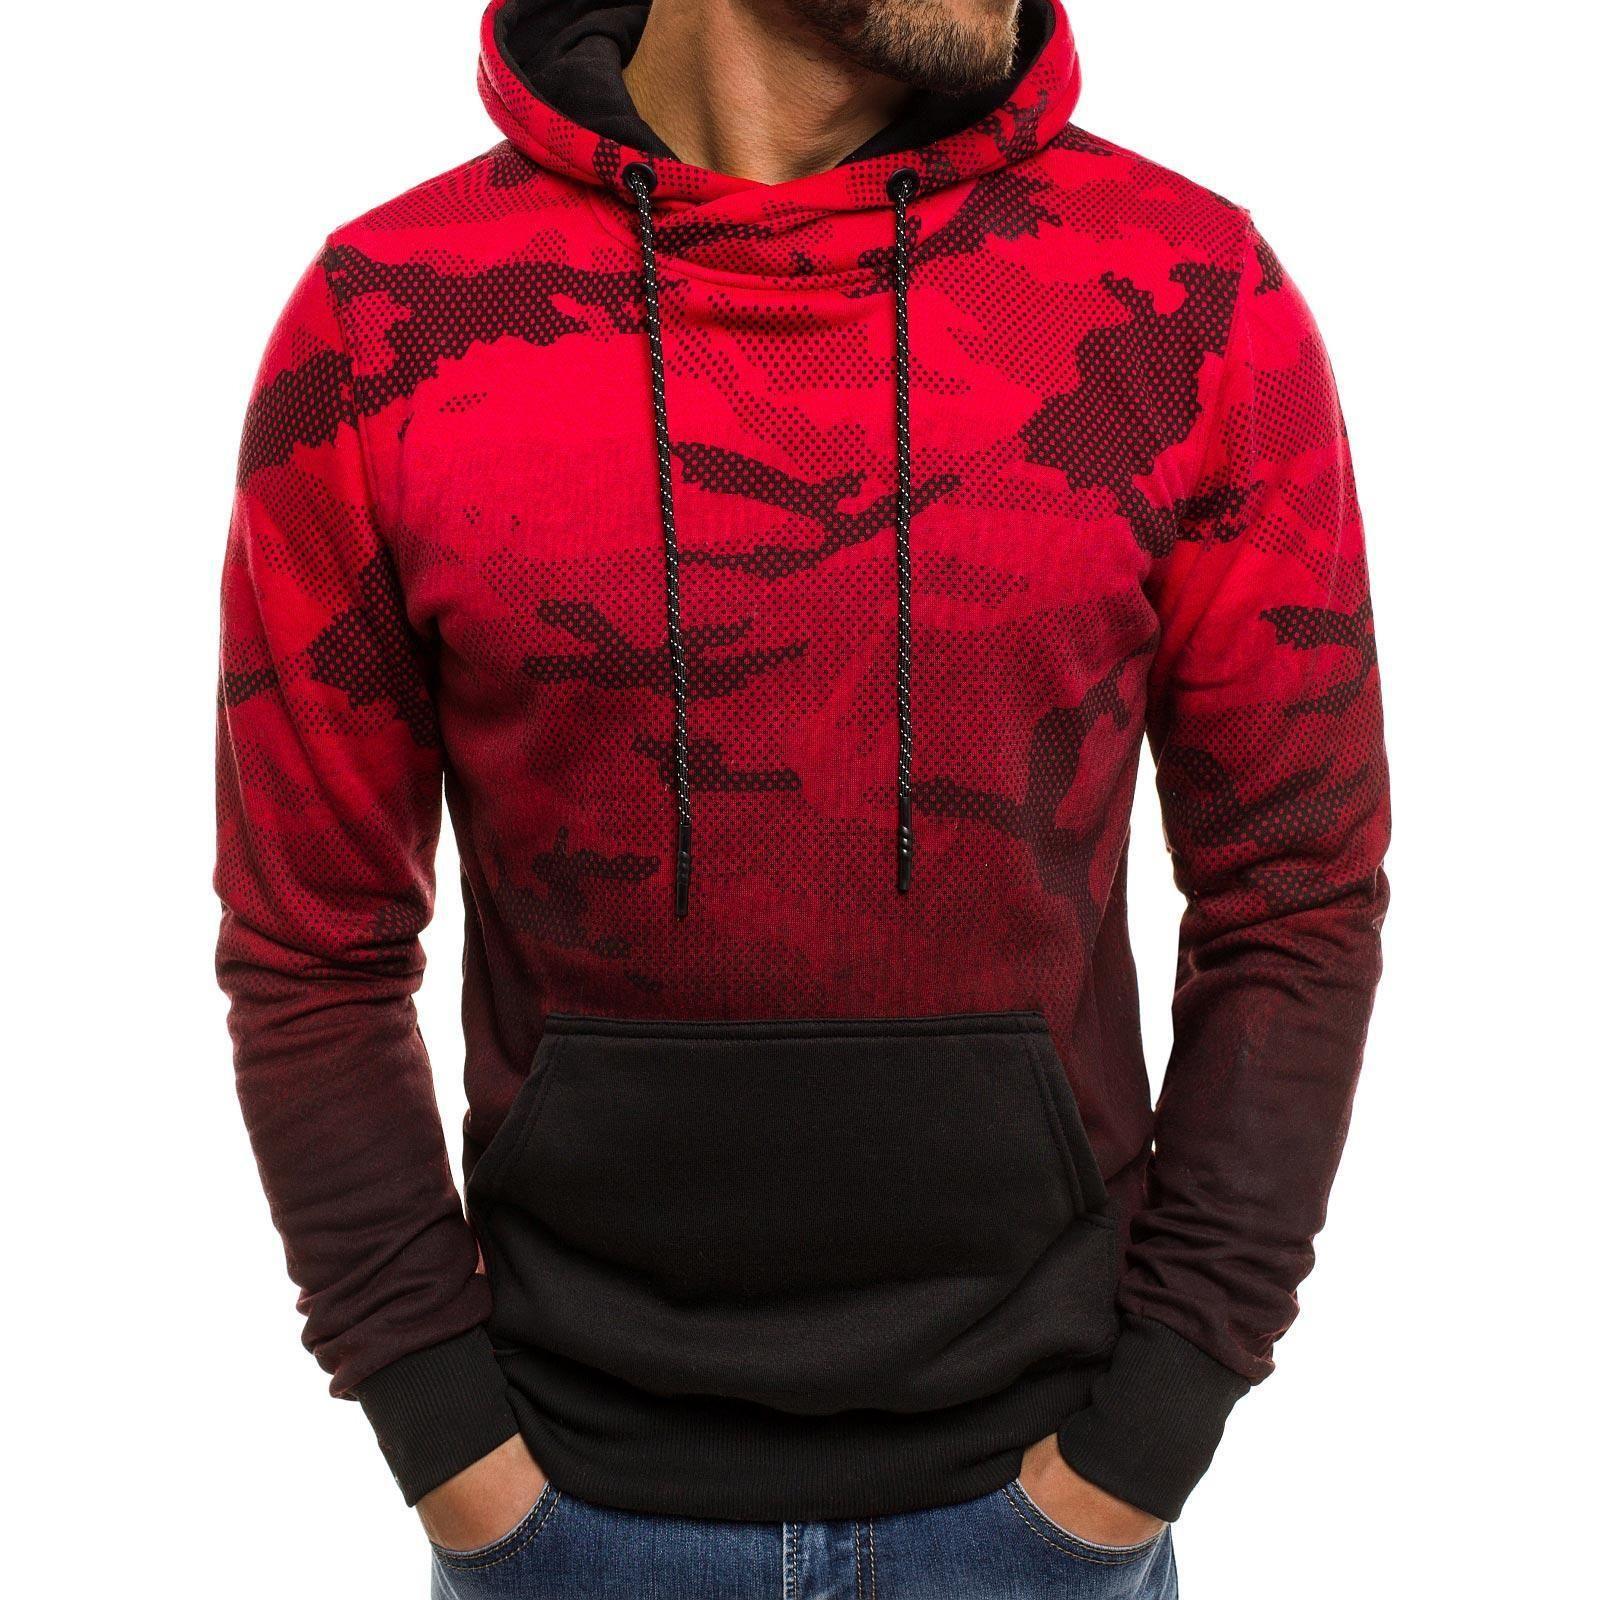 7aa085408e2 Men Cotton Hoodies Jacket Coat Long Sleeved Streetwear Fitness ...